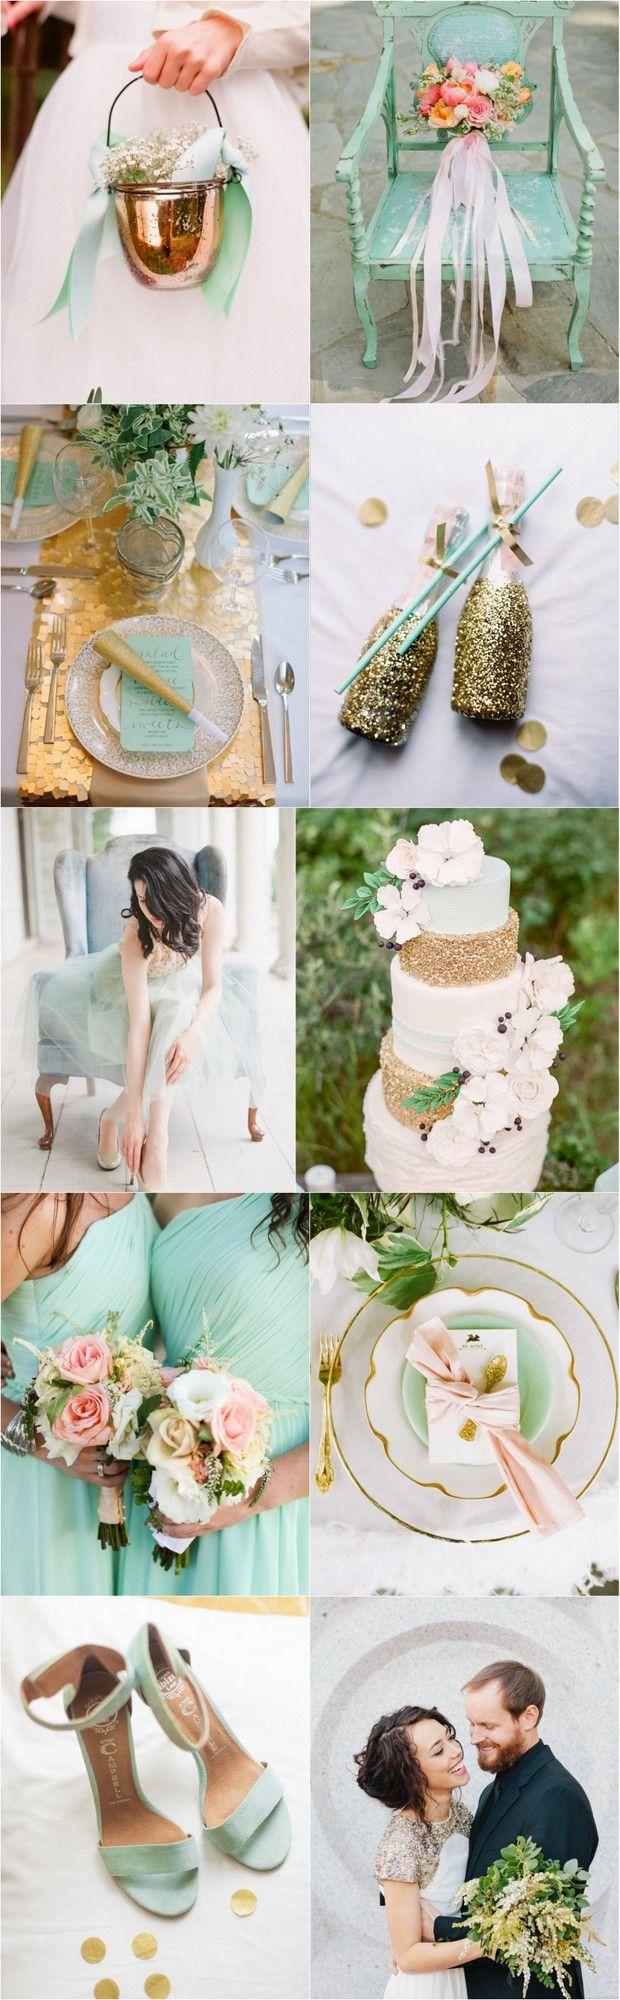 Mint, Gold & Pink Palette – Fabulously Fresh & Modern Spring Wedding Style for 2014 | weddingsonline